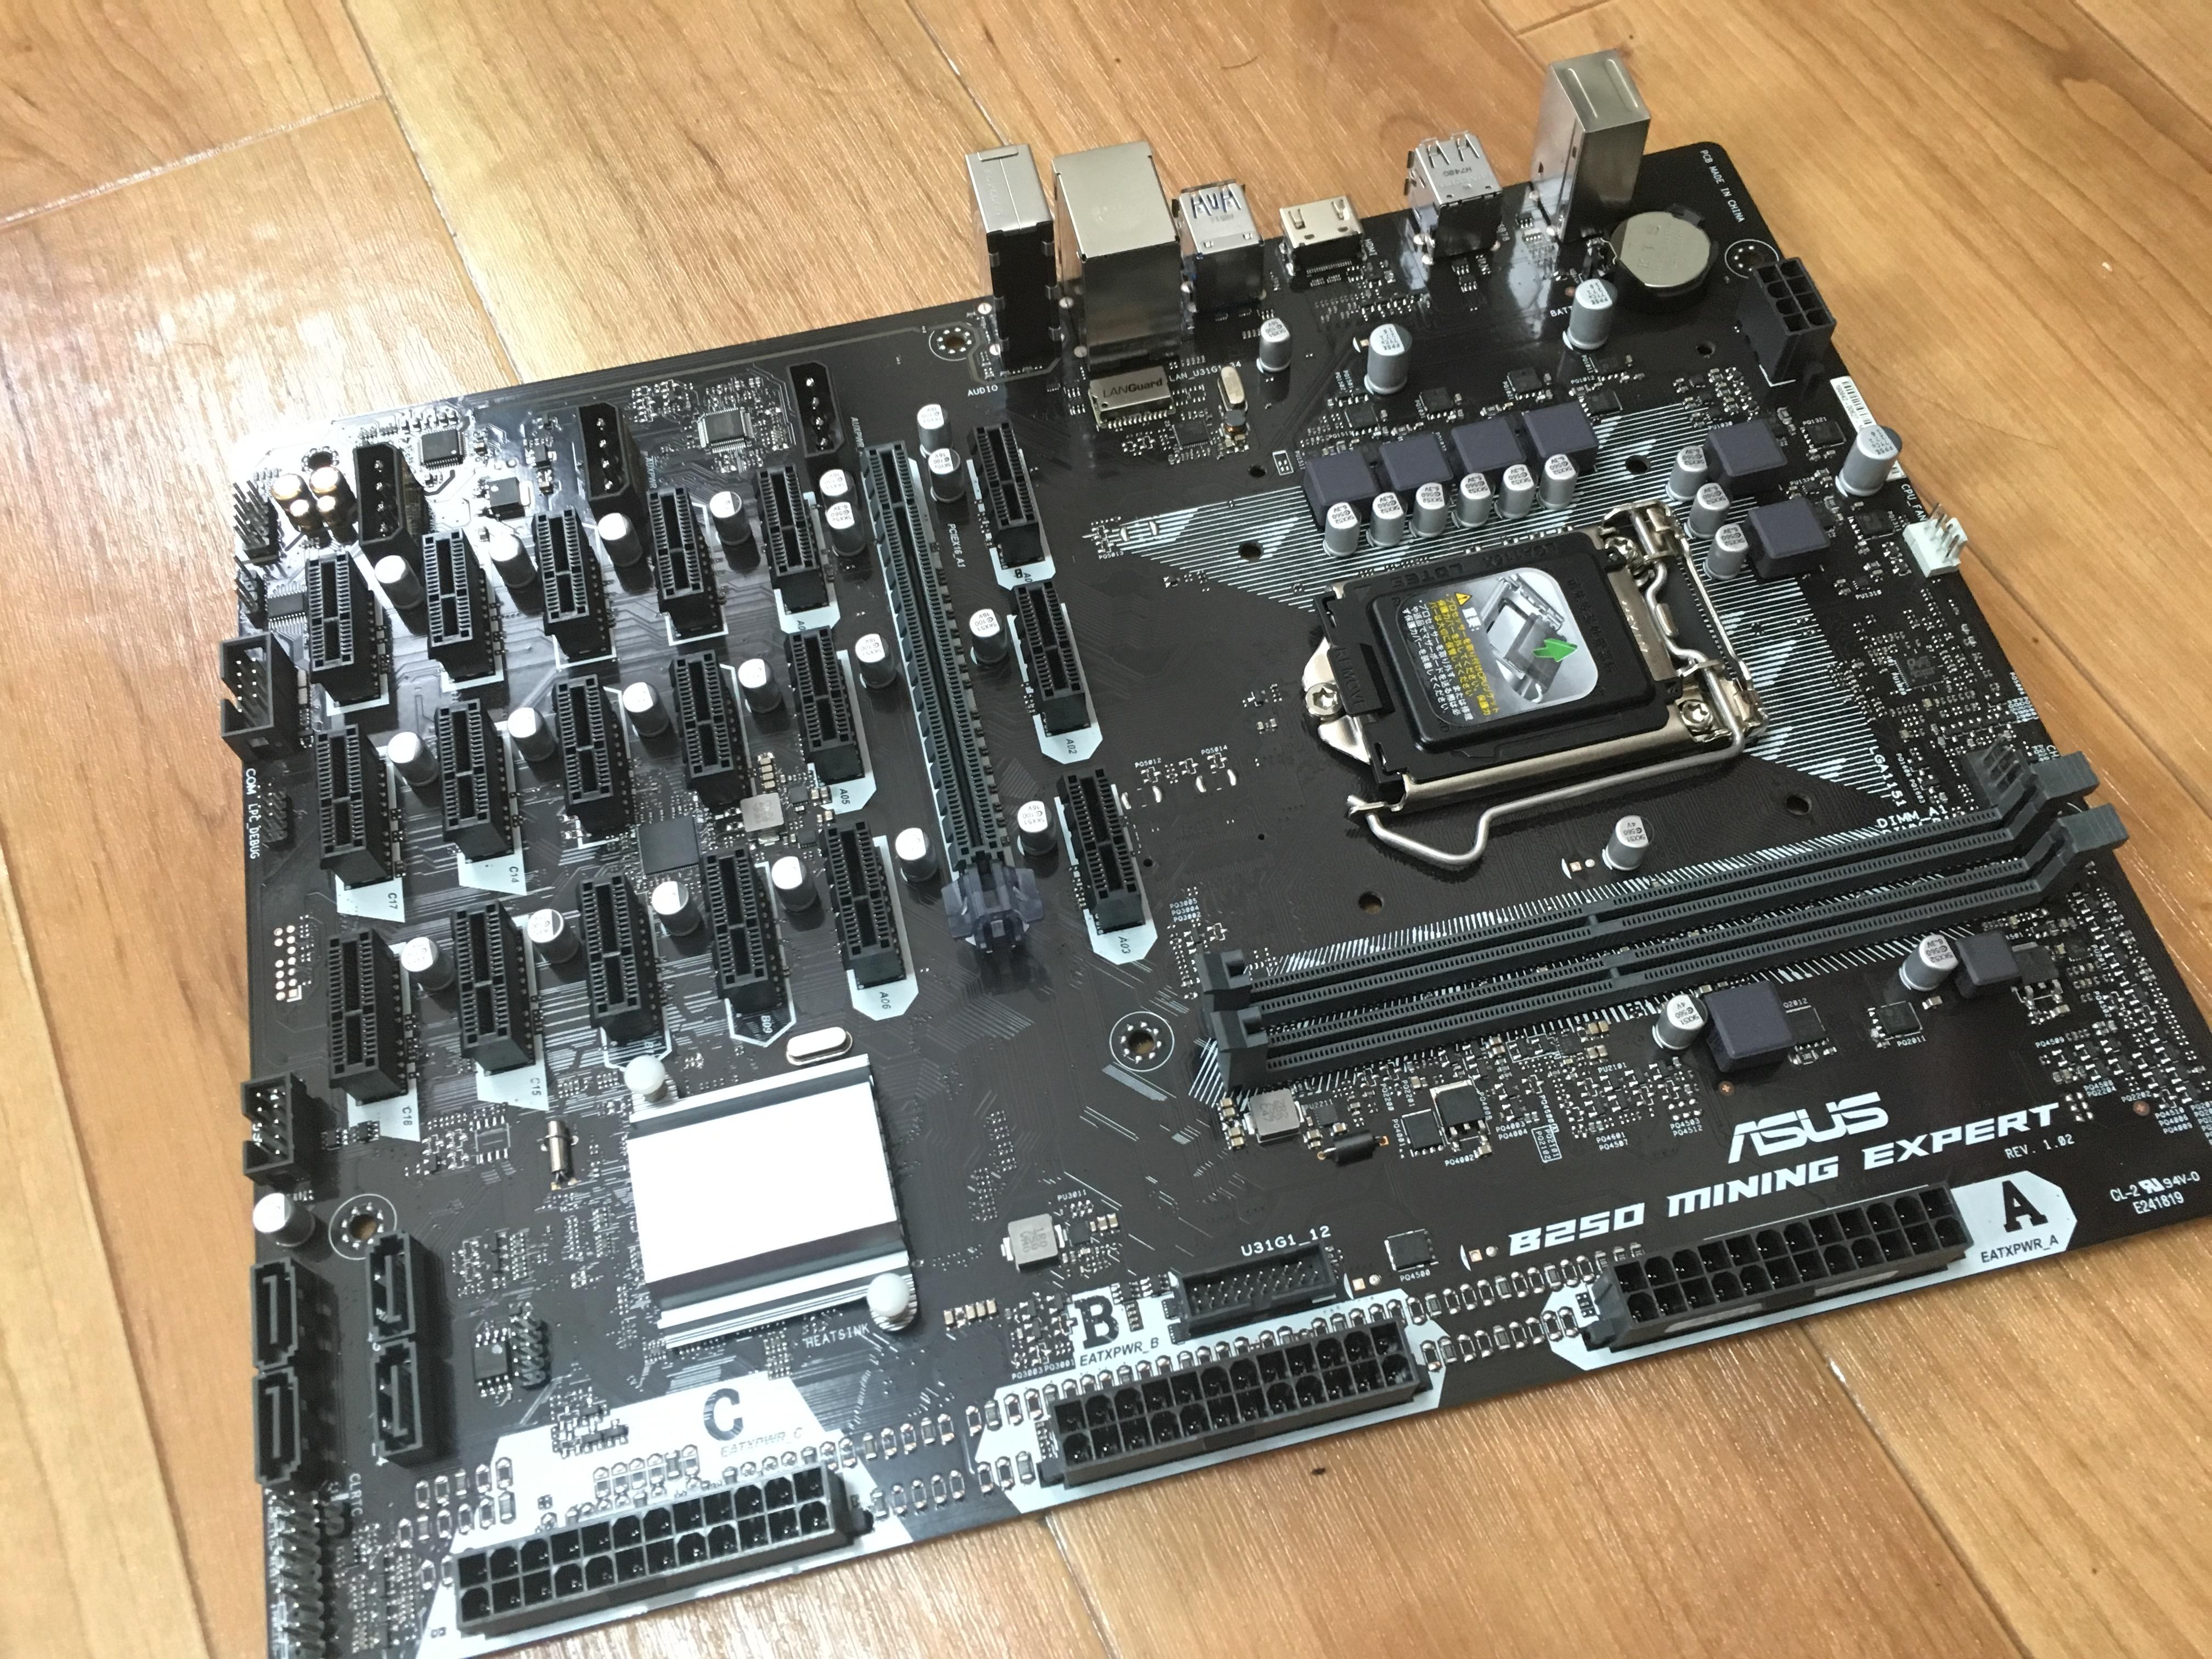 GPU19枚接続!凶悪マザーボードB250 MINING EXPERTが値下げ!